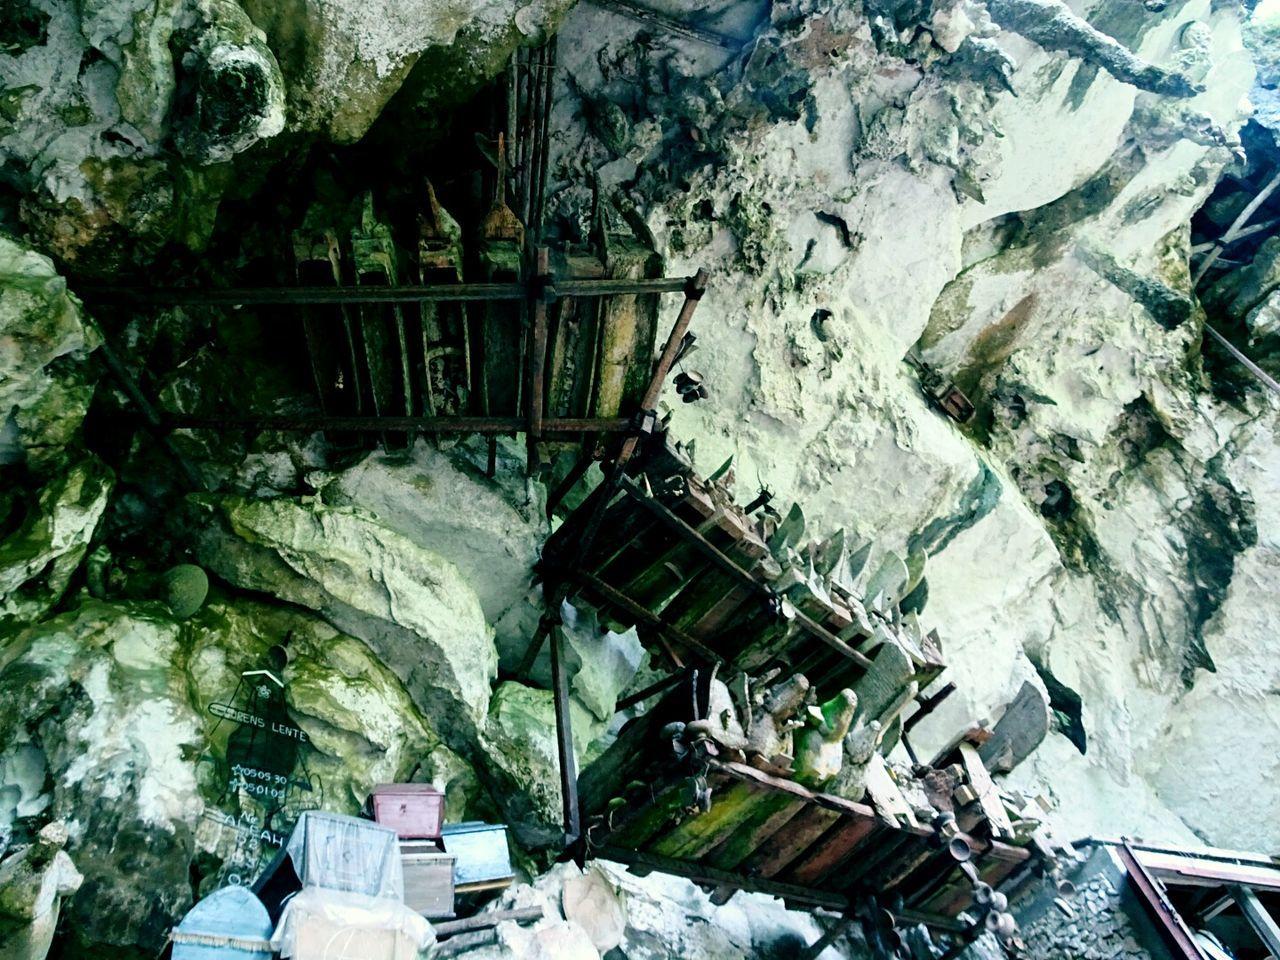 Traditional graveyard, hanging coffins, Toraja, Indonesia Graveyard Coffins  Traditional Traditional Culture Culture Ethnic Ethnicity Grave Toraja Toraja Indonesia Cave Caves